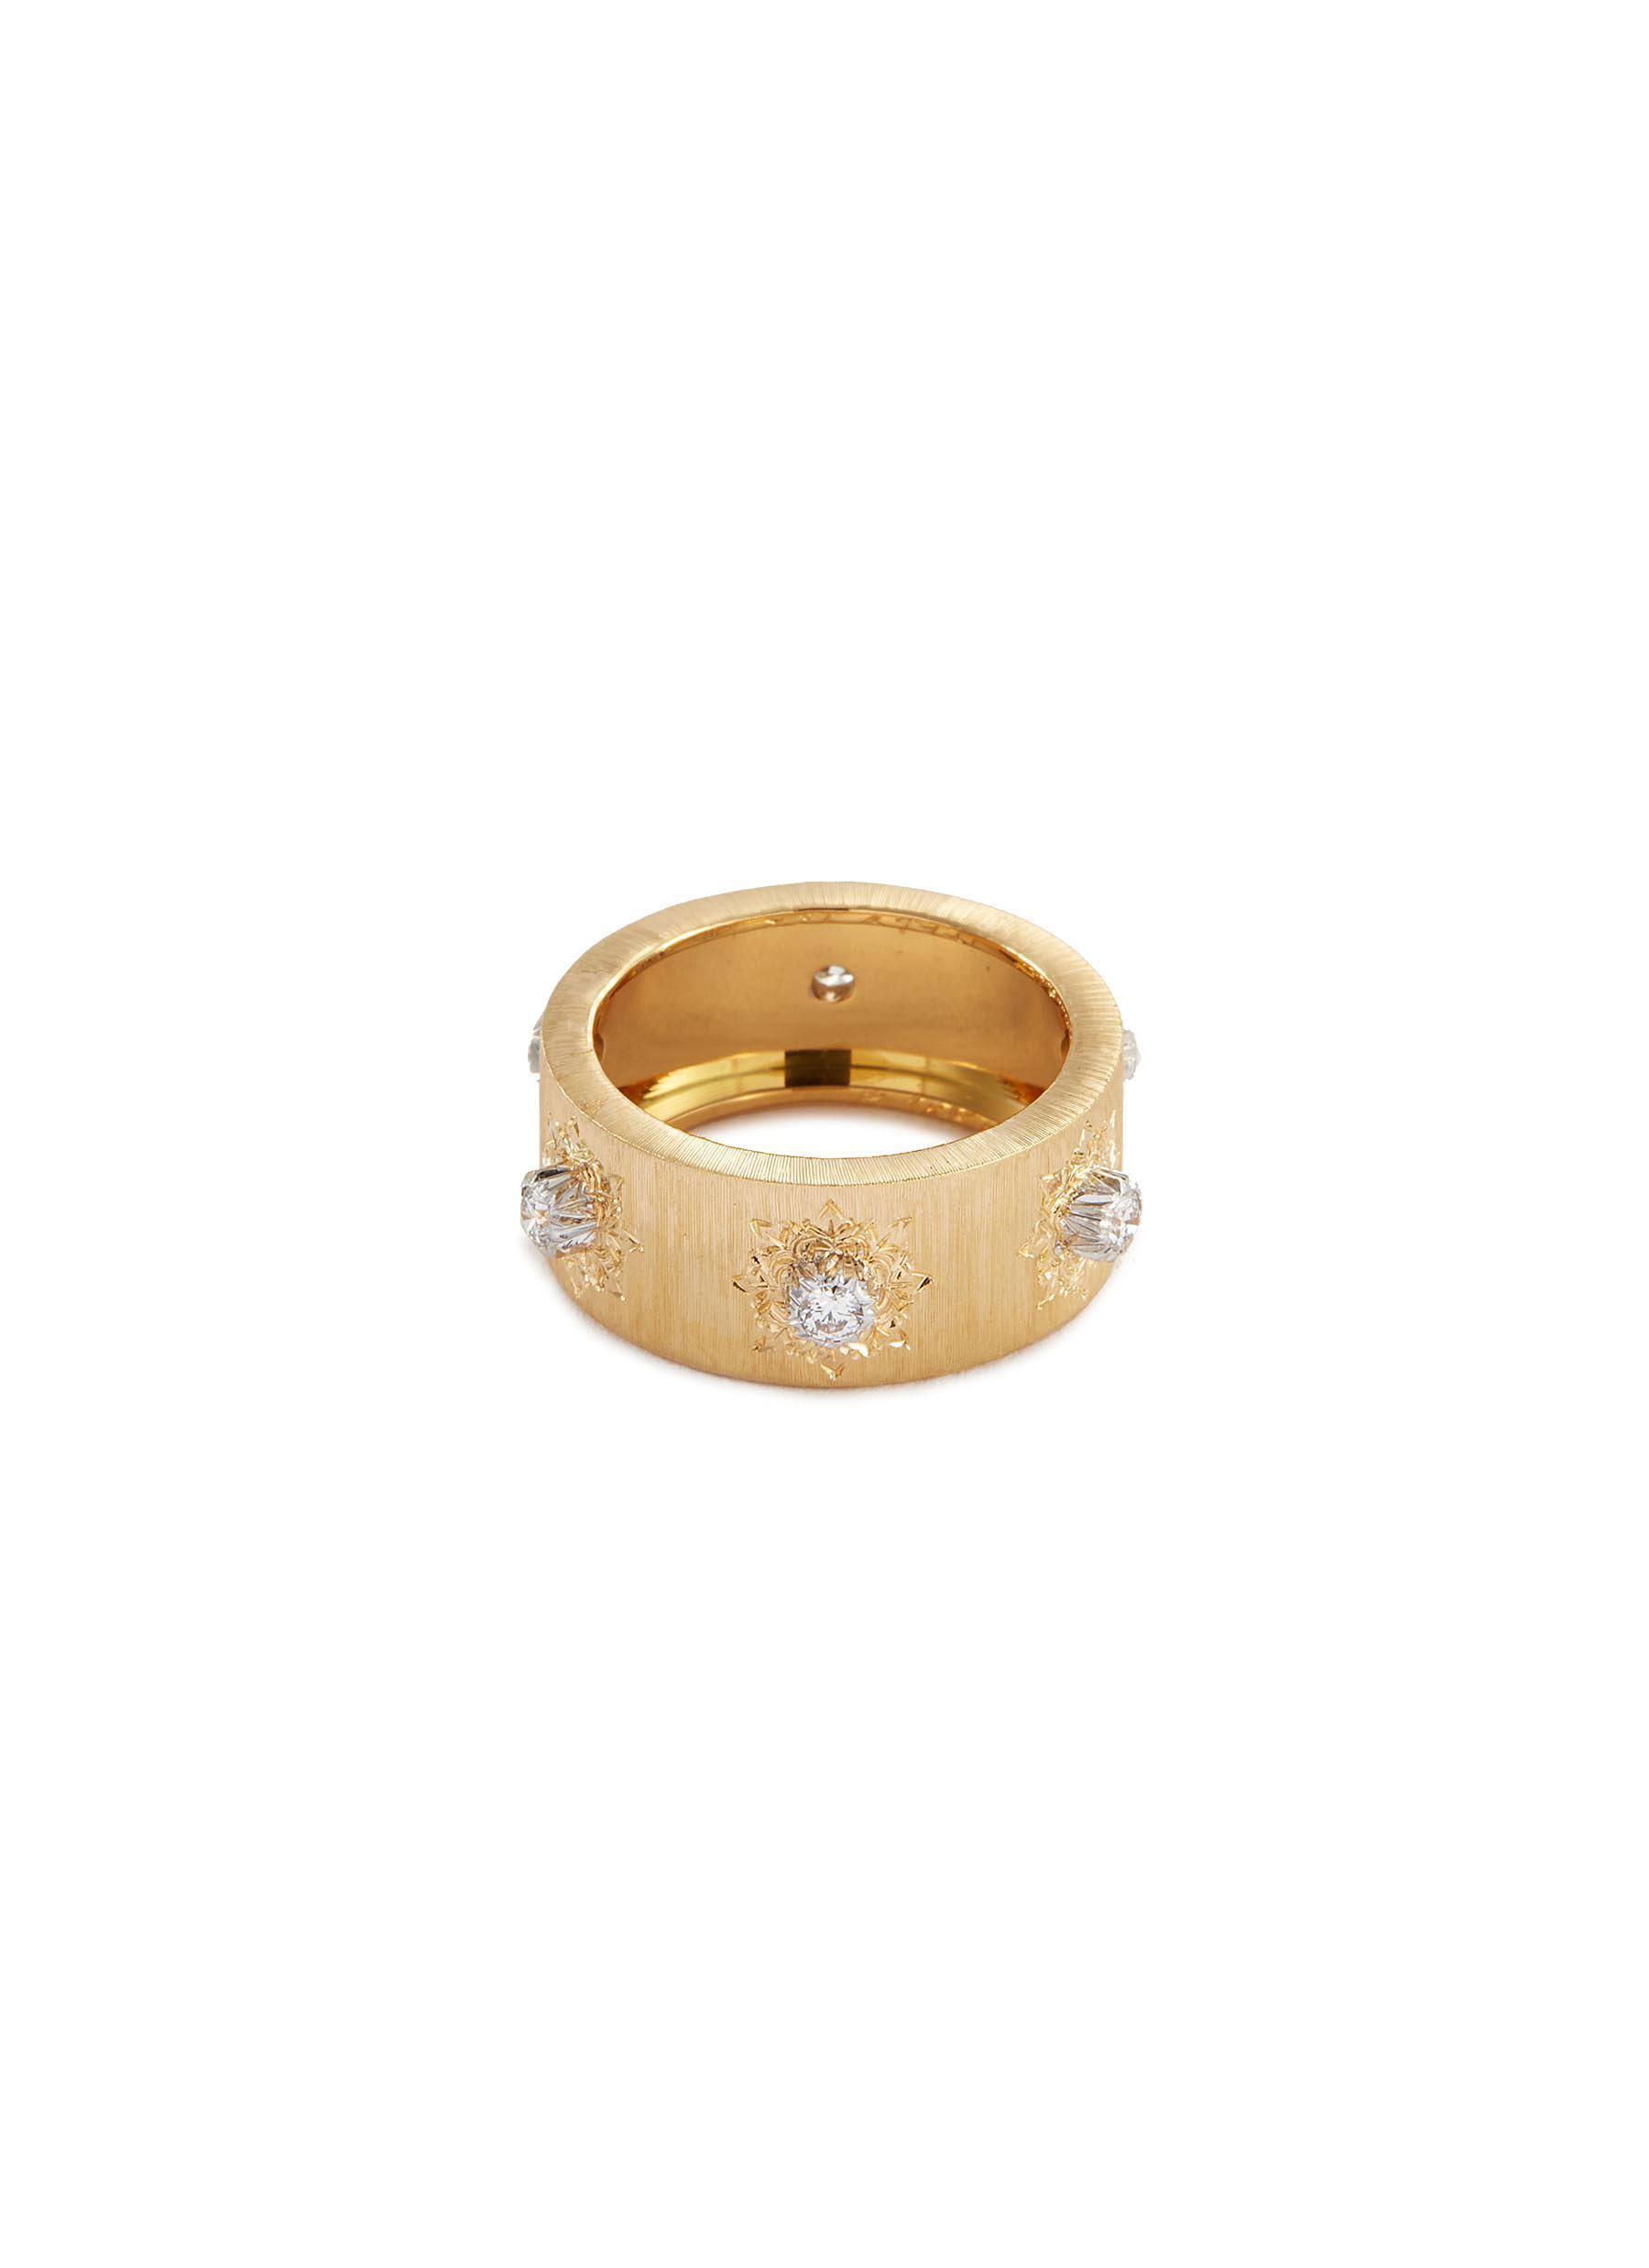 'Macri' diamond gold ring